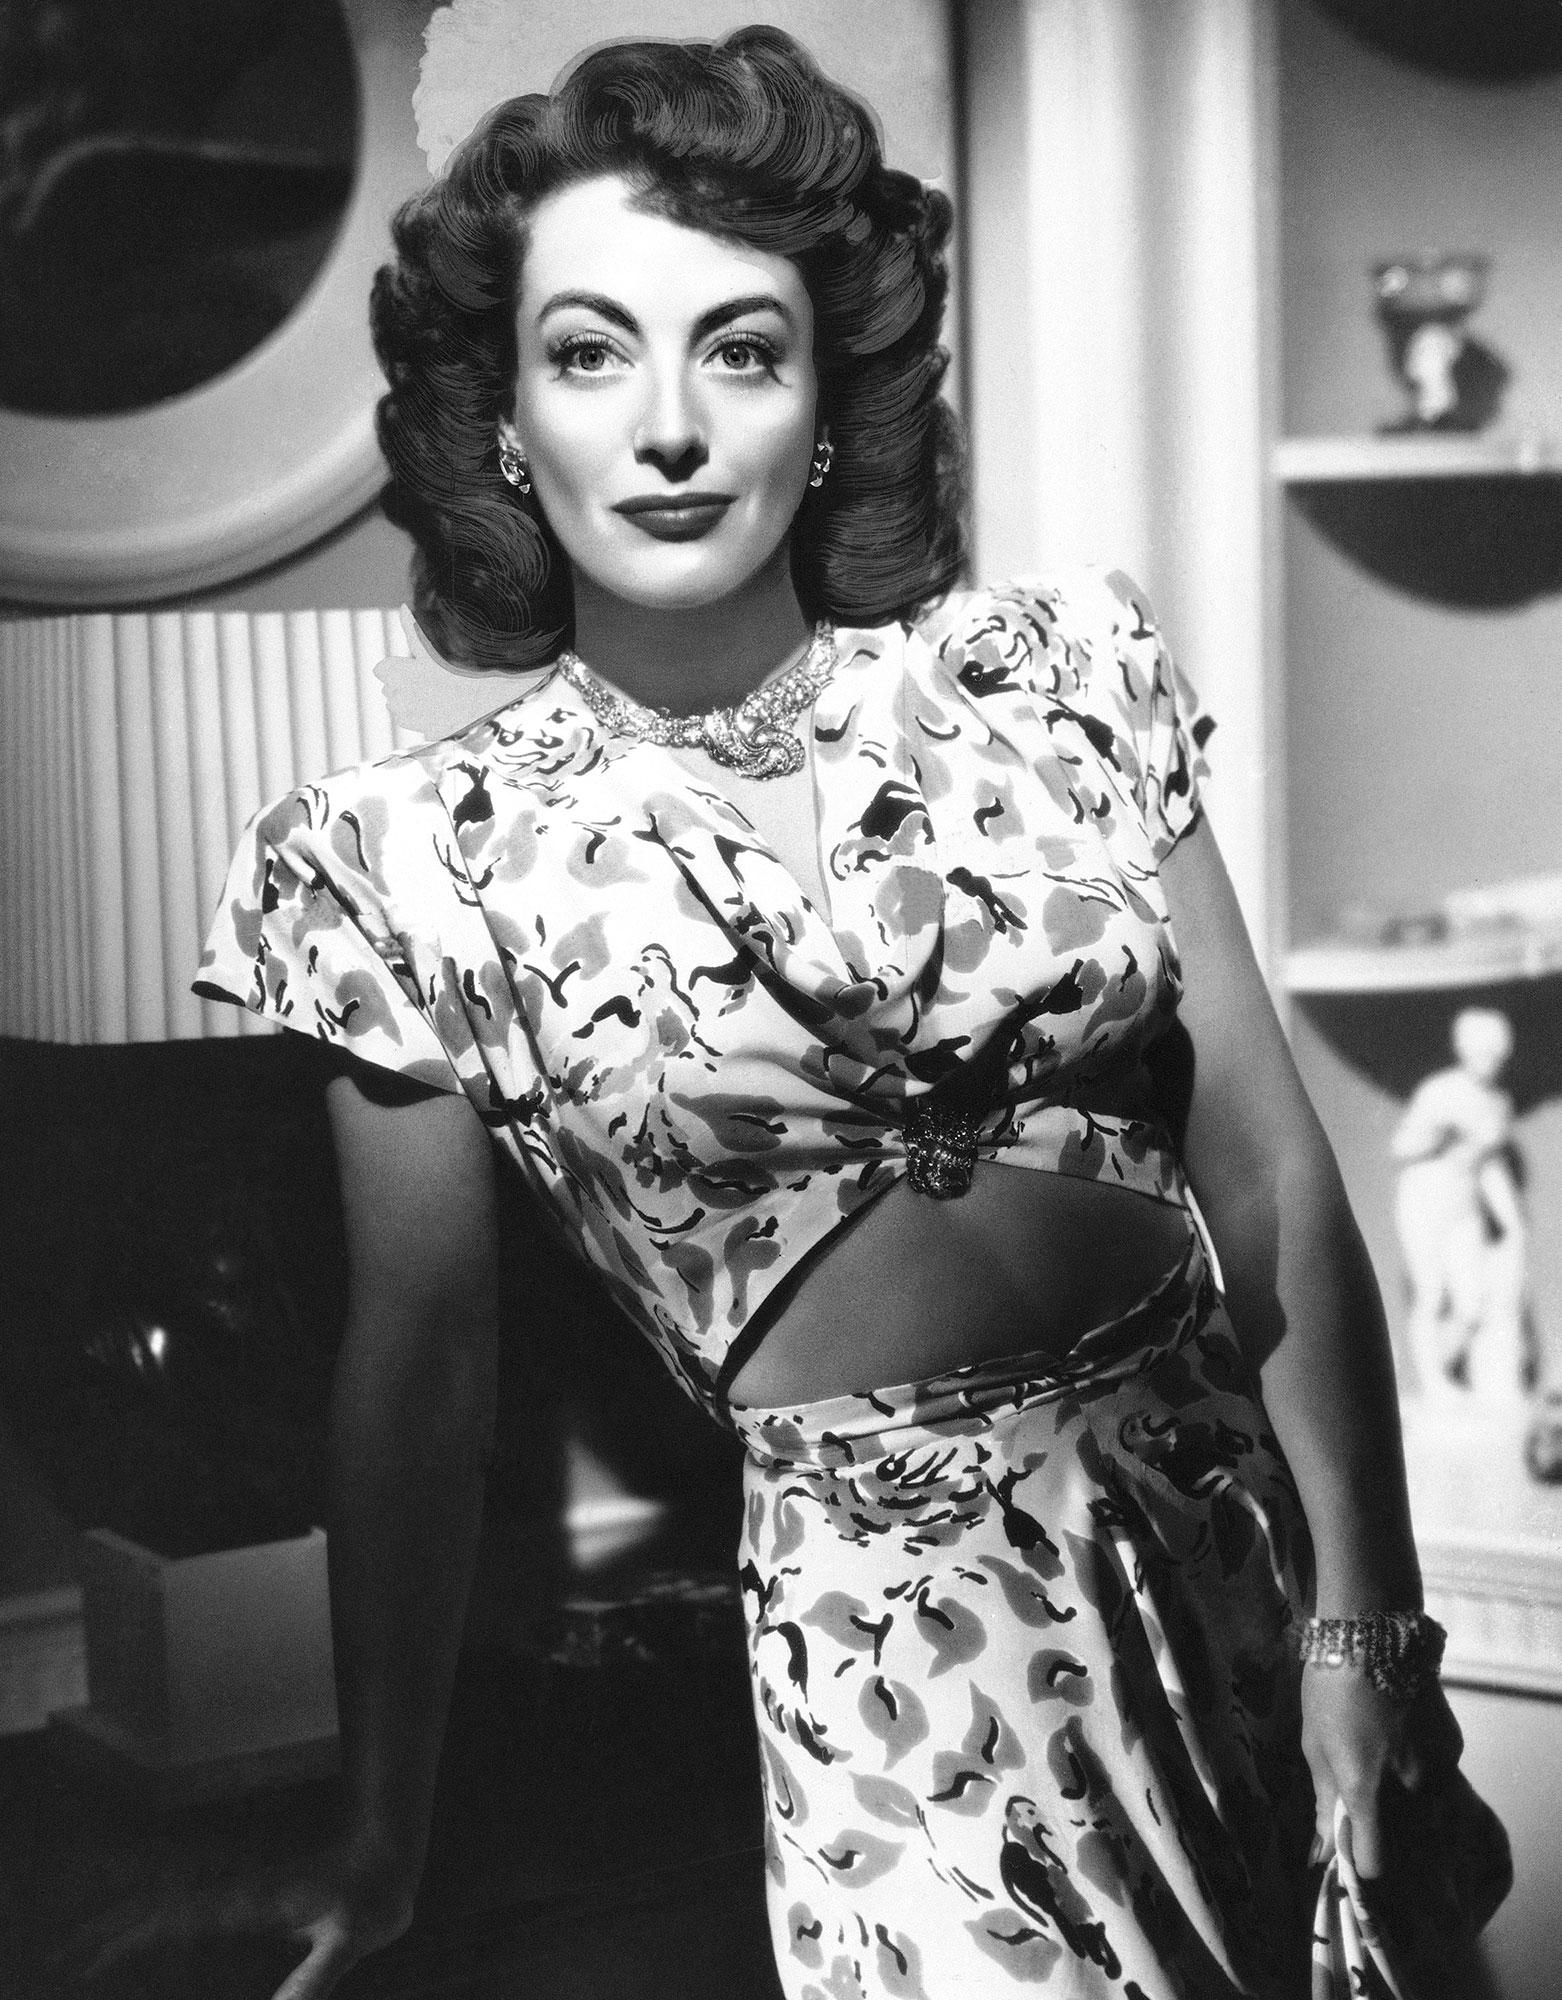 Vintage 60\u2019s 70\u2019s Floral Dress worn by actress Holly Taylor from \u201cDolly Parton\u2019s Heartstrings\u201d on Netflix